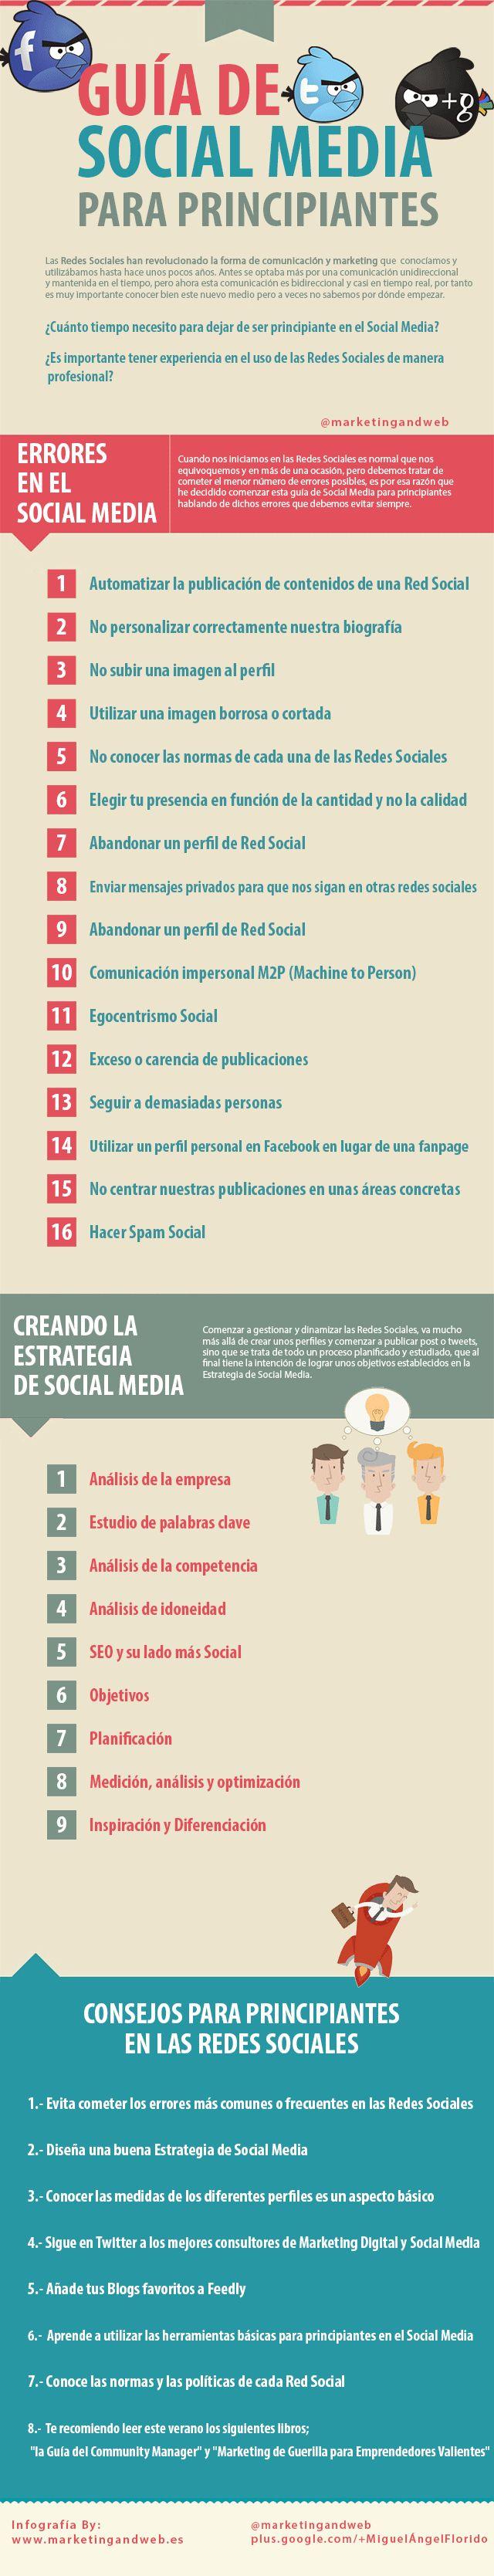 Manual Social Media para dummies @OliniaOS #CreandoSoluciones